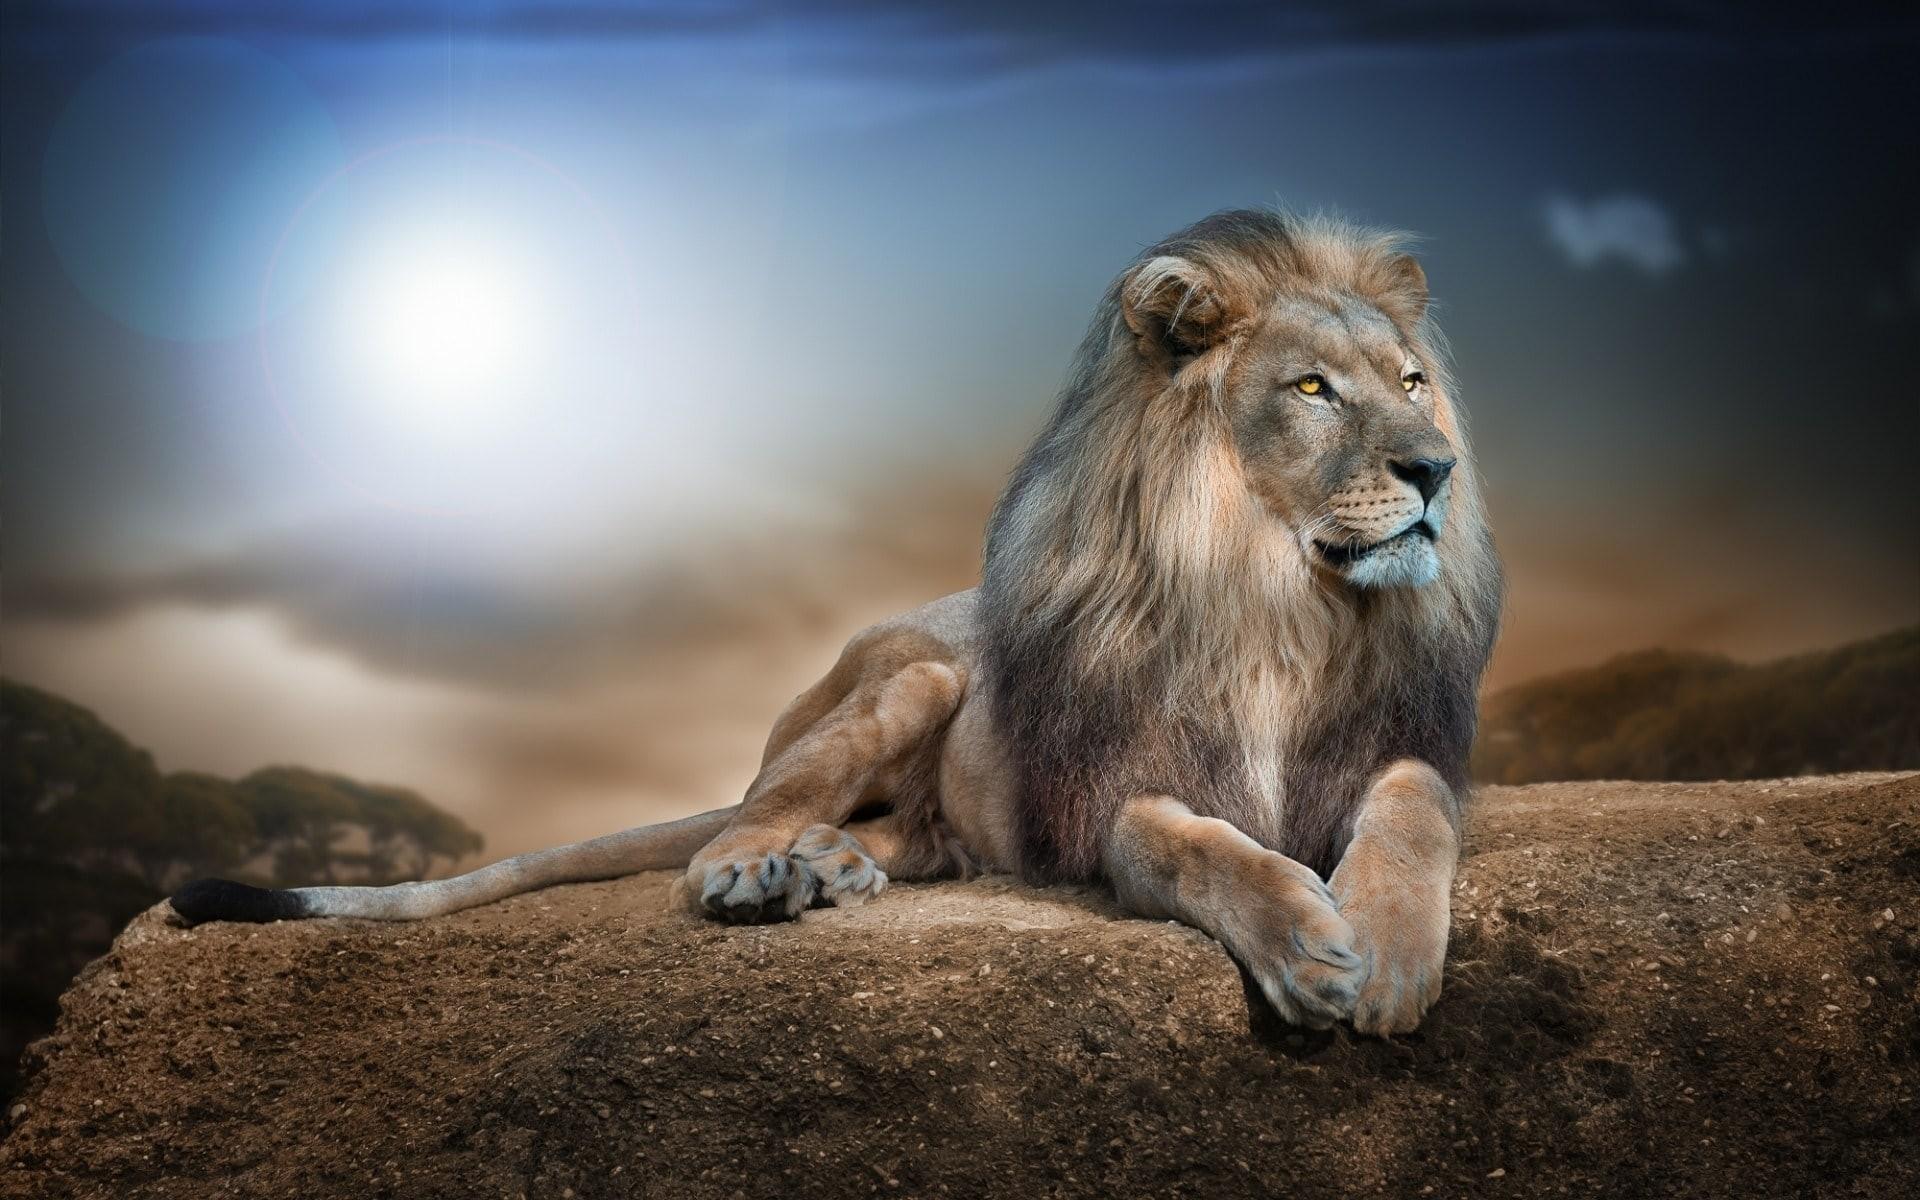 Lion HD pics Lion wallpapers hd